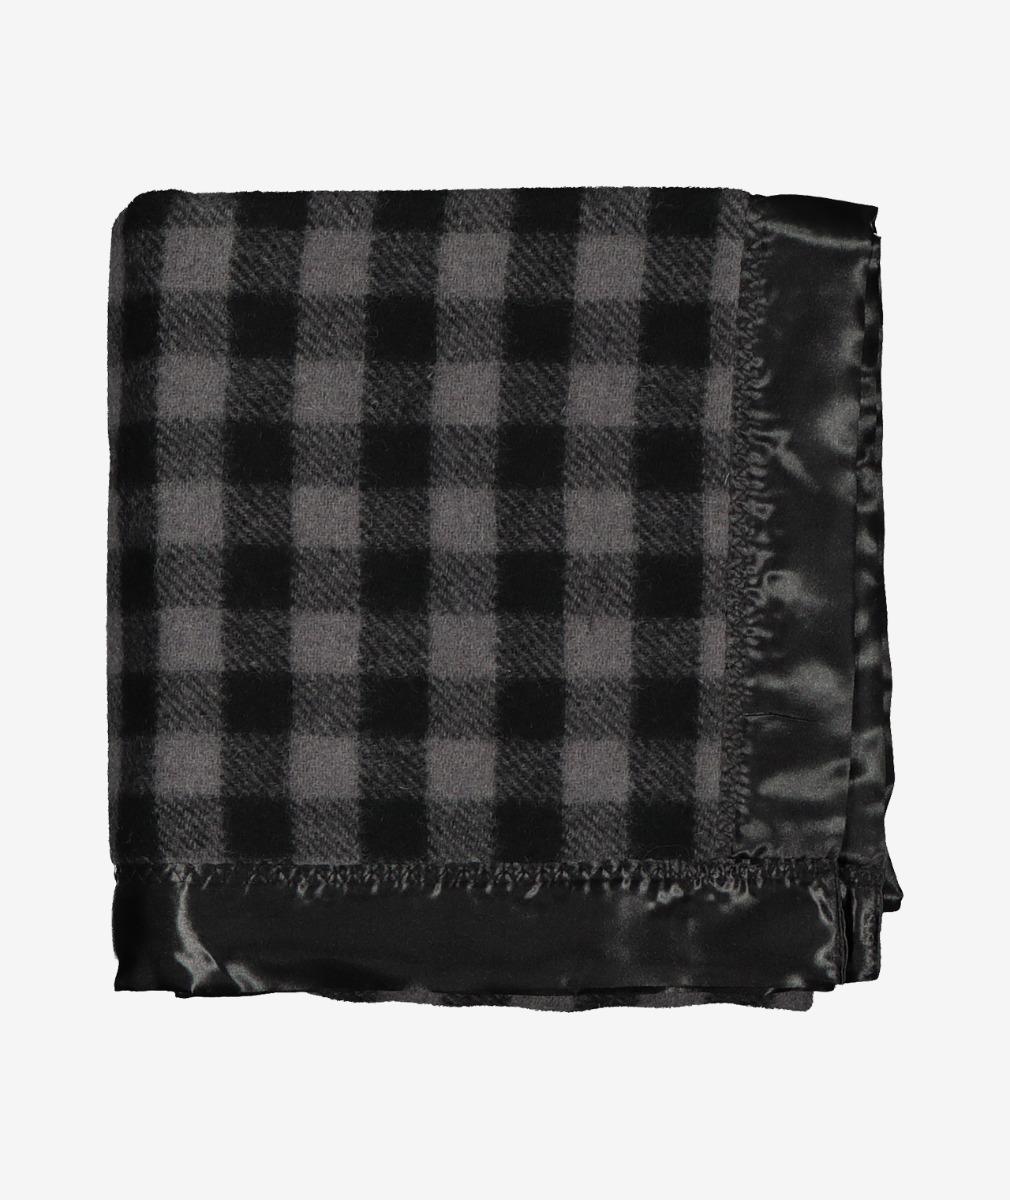 Swanndri Baby Buggy Wool Blanket in Grey/Black Check